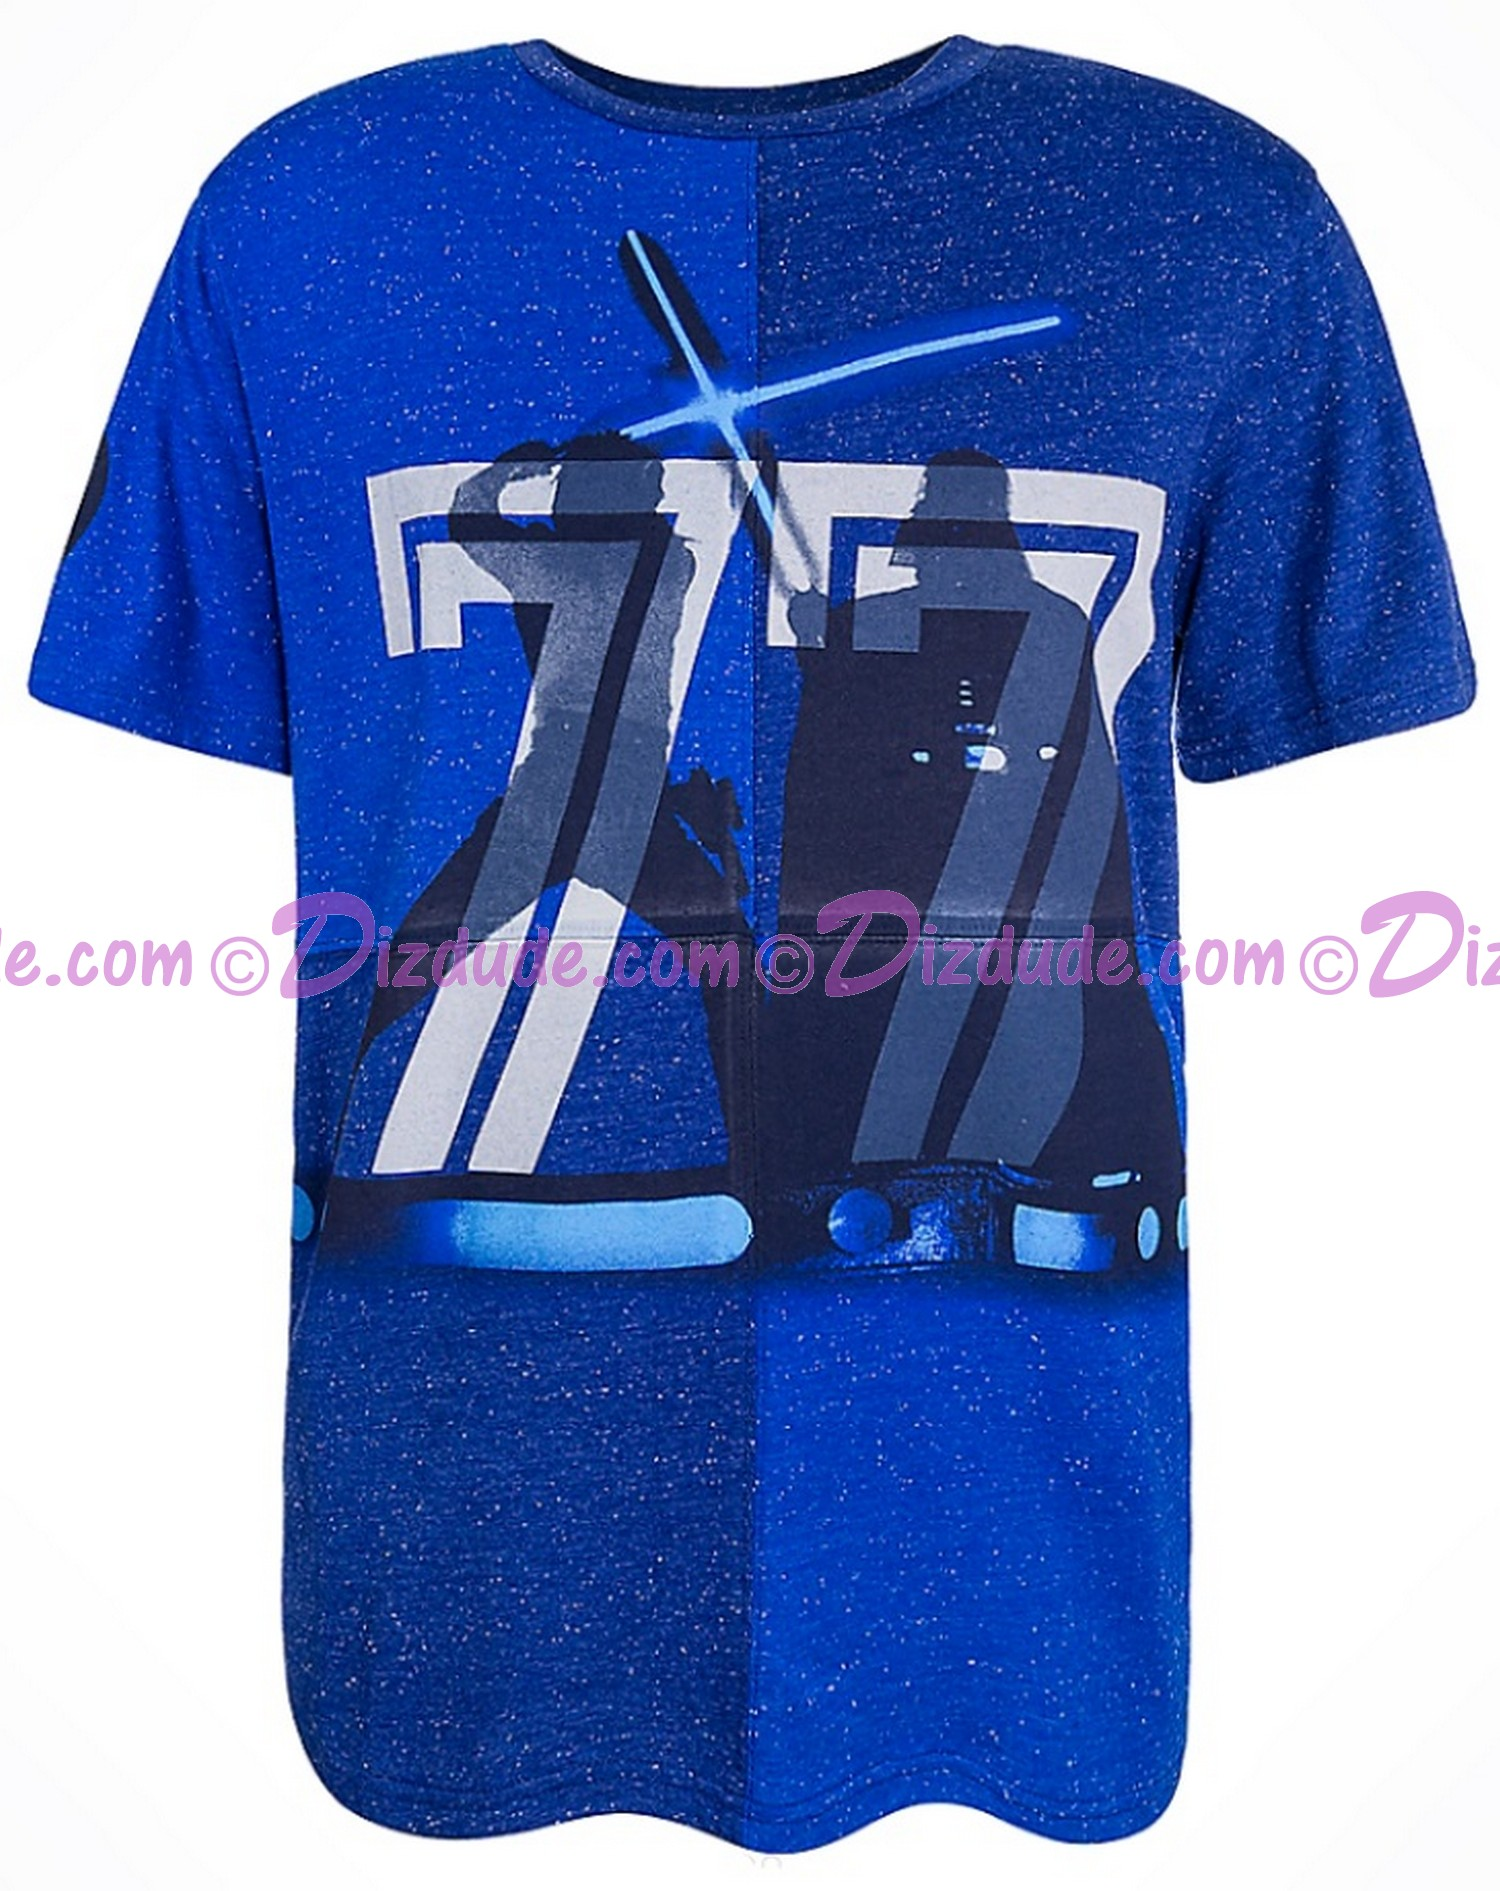 Disney Star Wars Vintage 77 Luke Skywalker & Darth Vader Dueling Adult T-Shirt (Tshirt, T shirt or Tee) © Dizdude.com